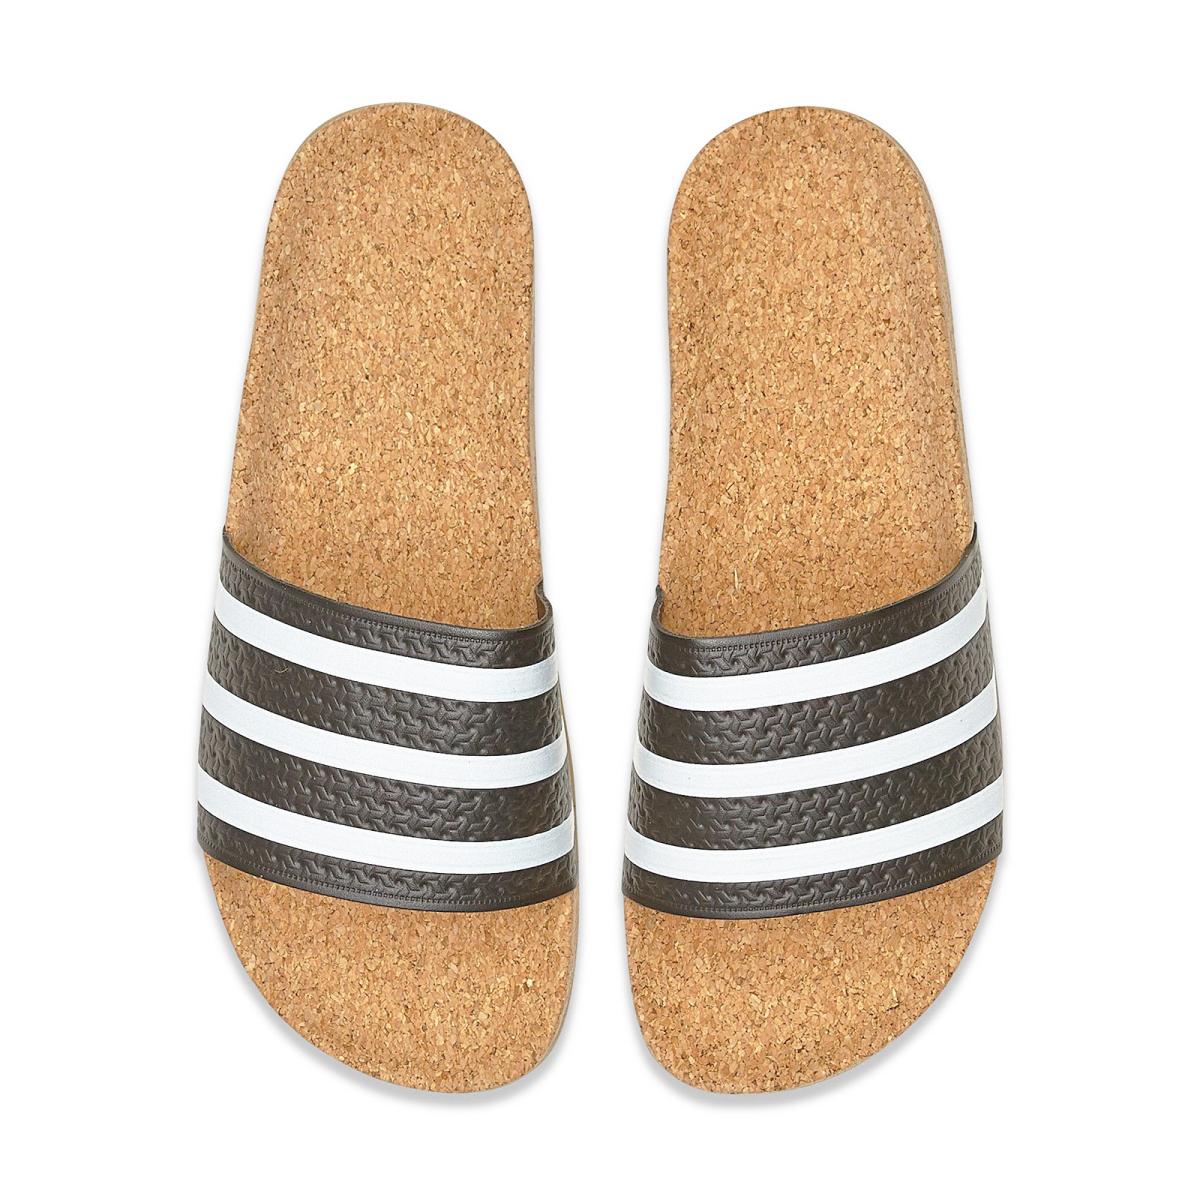 adidas ADILETTE CORK SLIDES W黑白軟木塞休閒經典復古款拖鞋女鞋GT Company BA7211